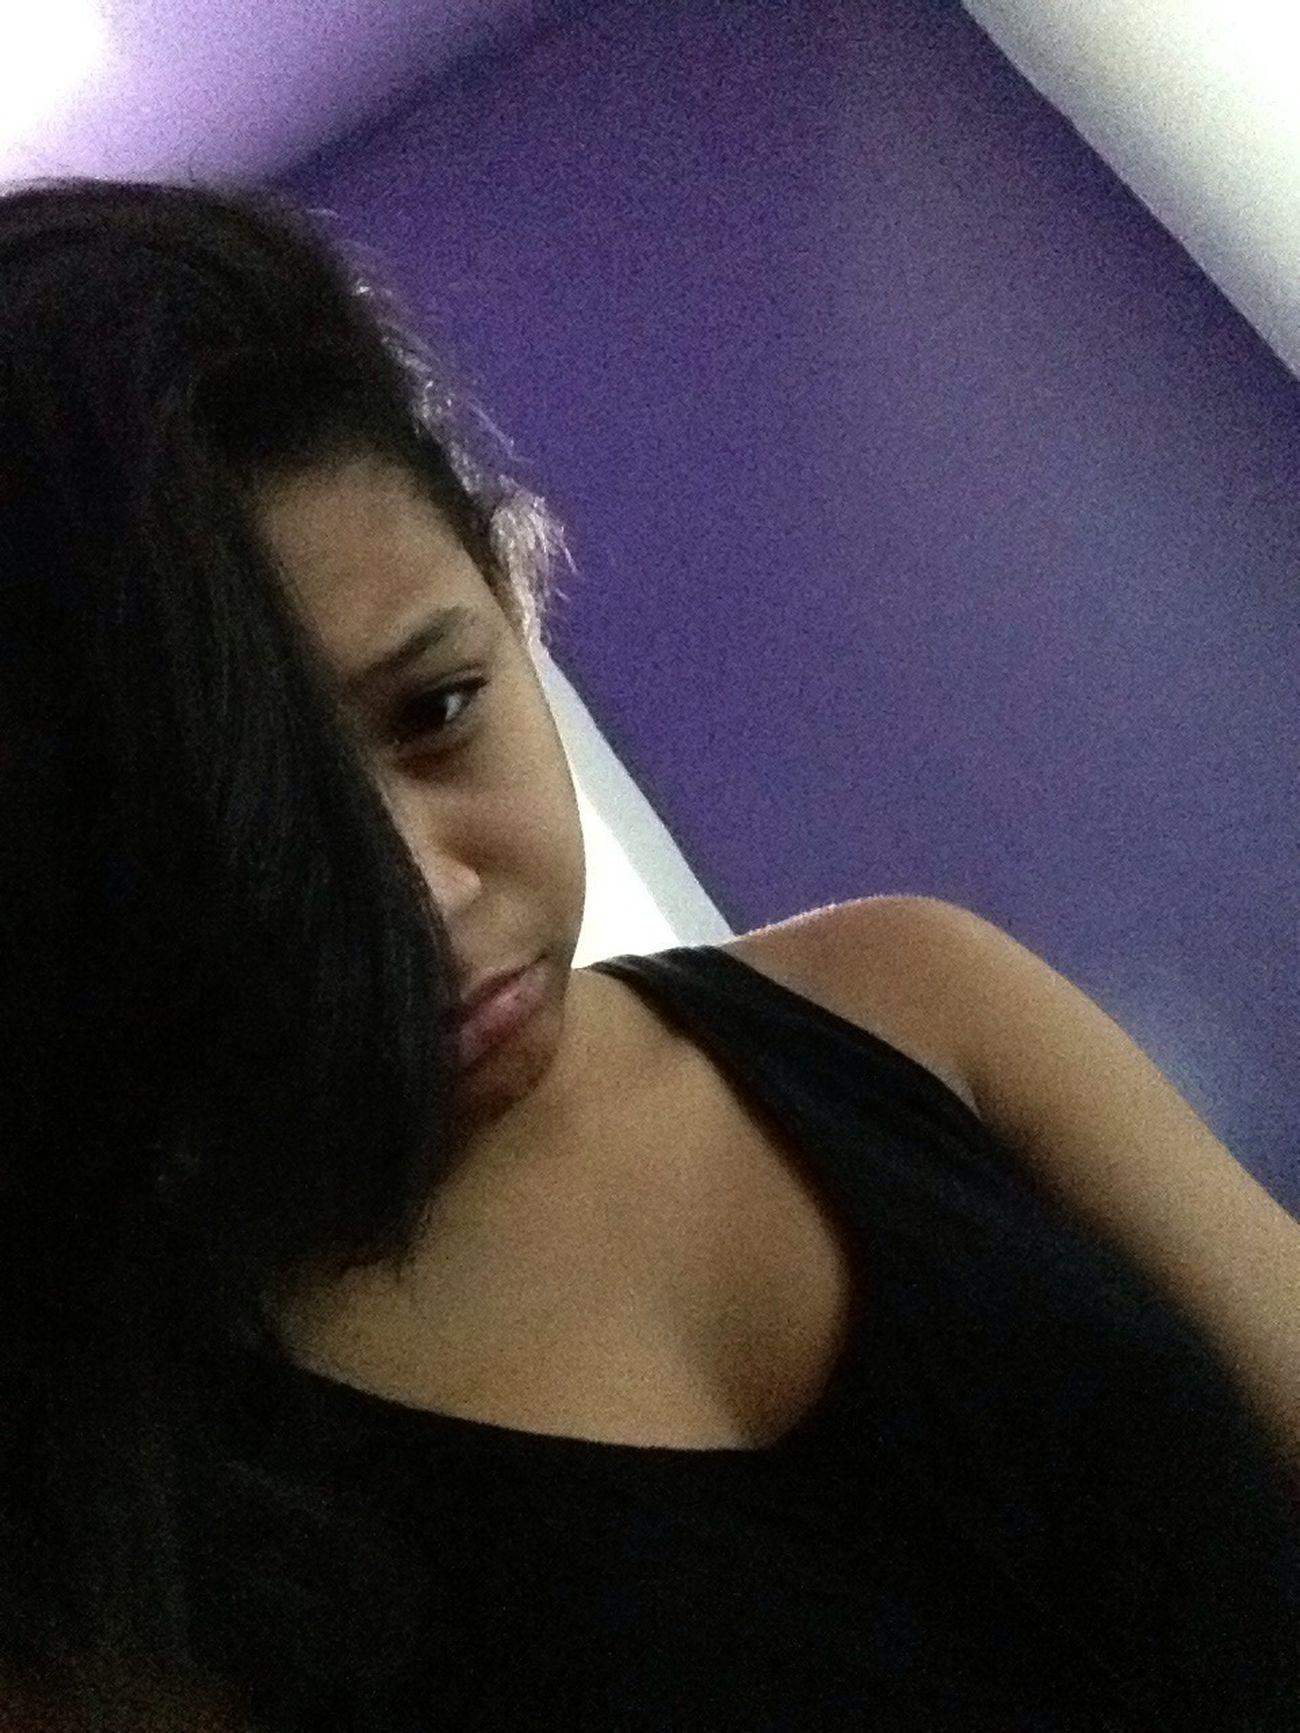 Being Sad